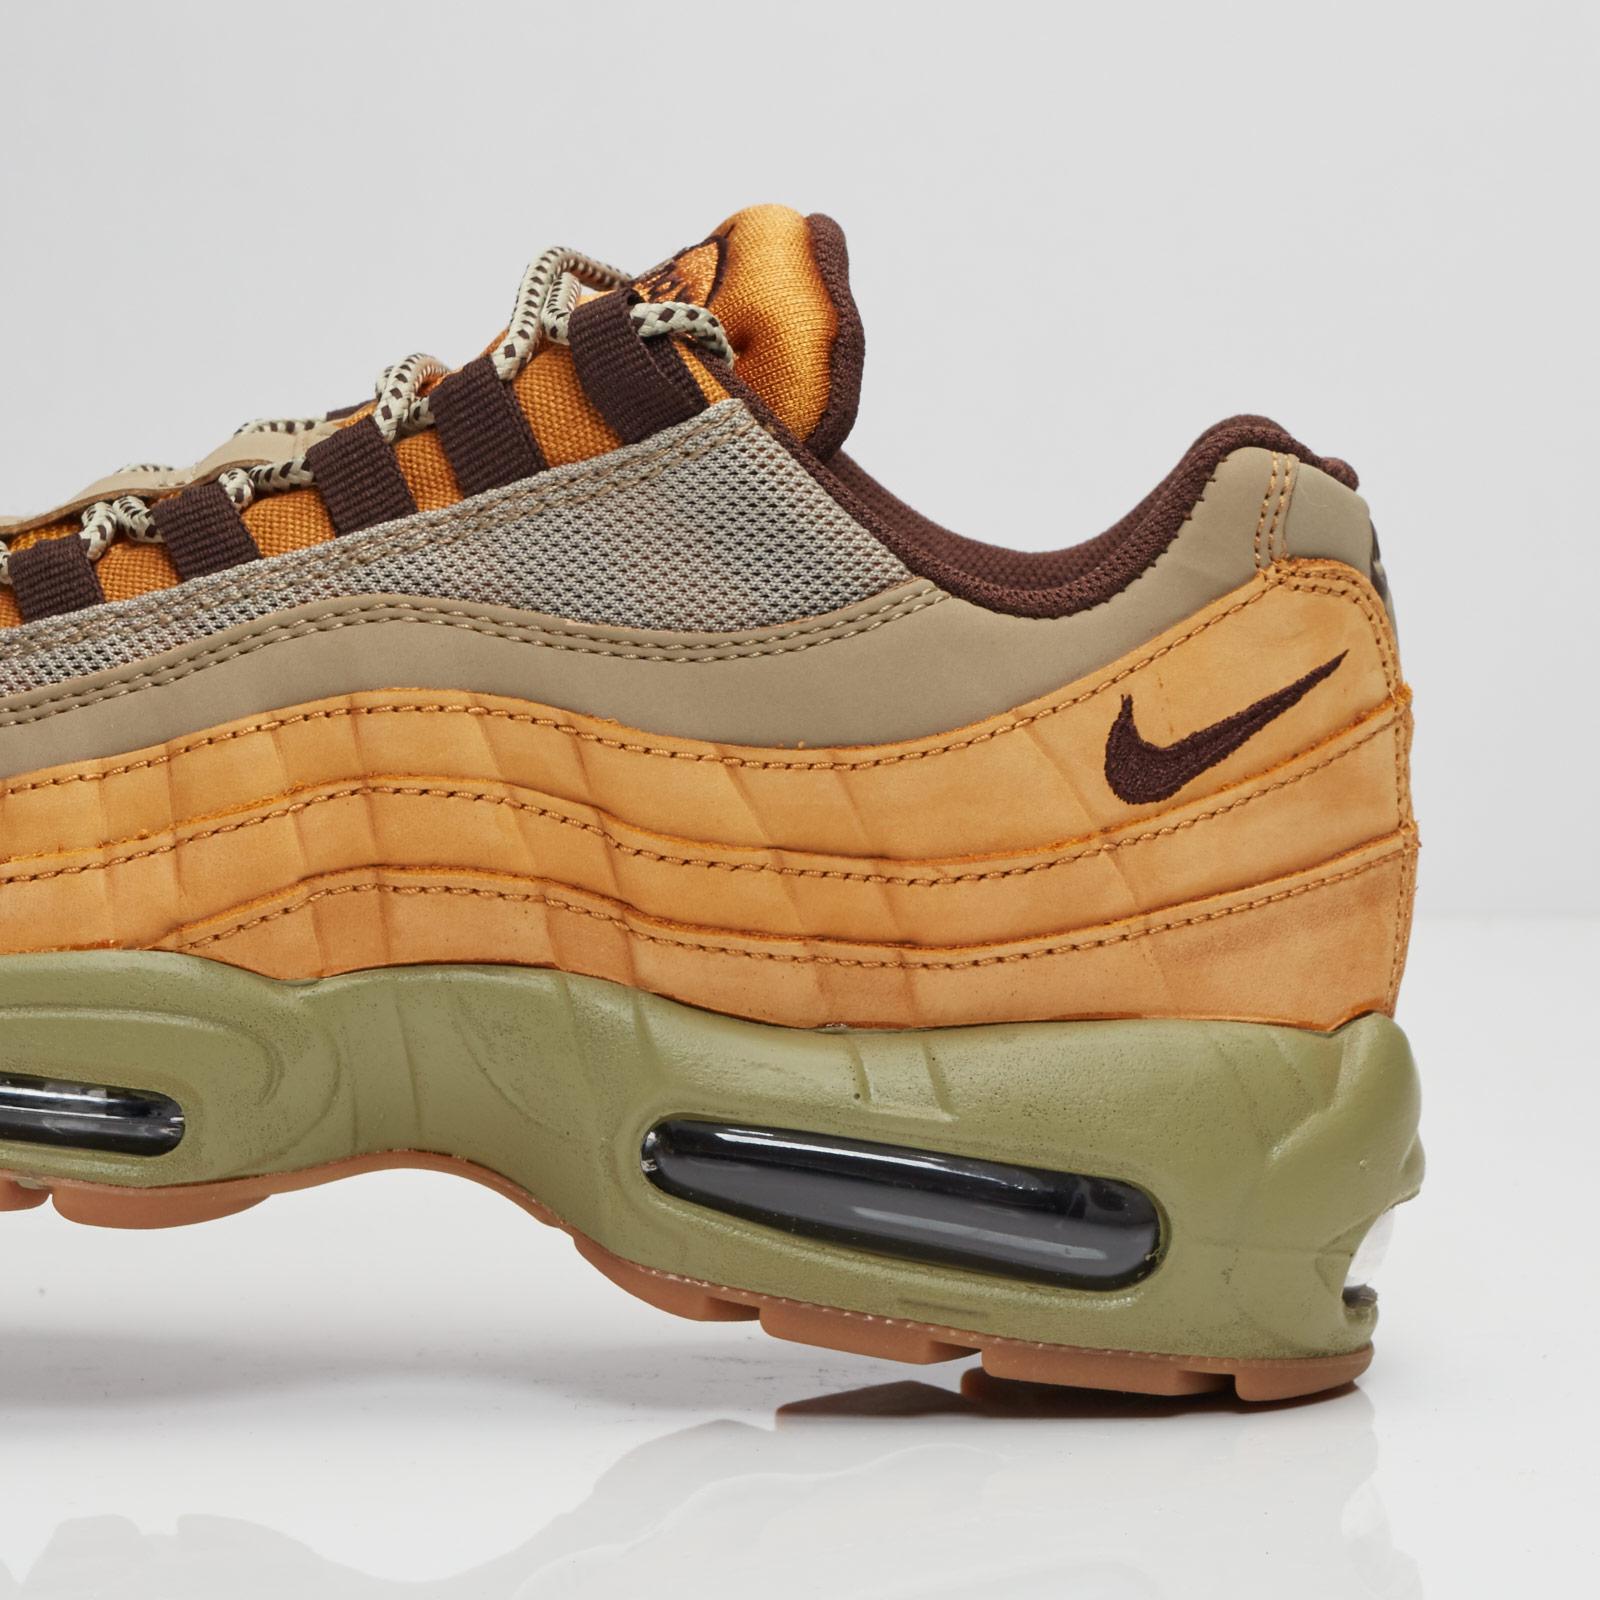 buy popular e4b85 8d8eb Nike Air Max 95 Premium - 538416-700 - Sneakersnstuff   sneakers   streetwear  online since 1999